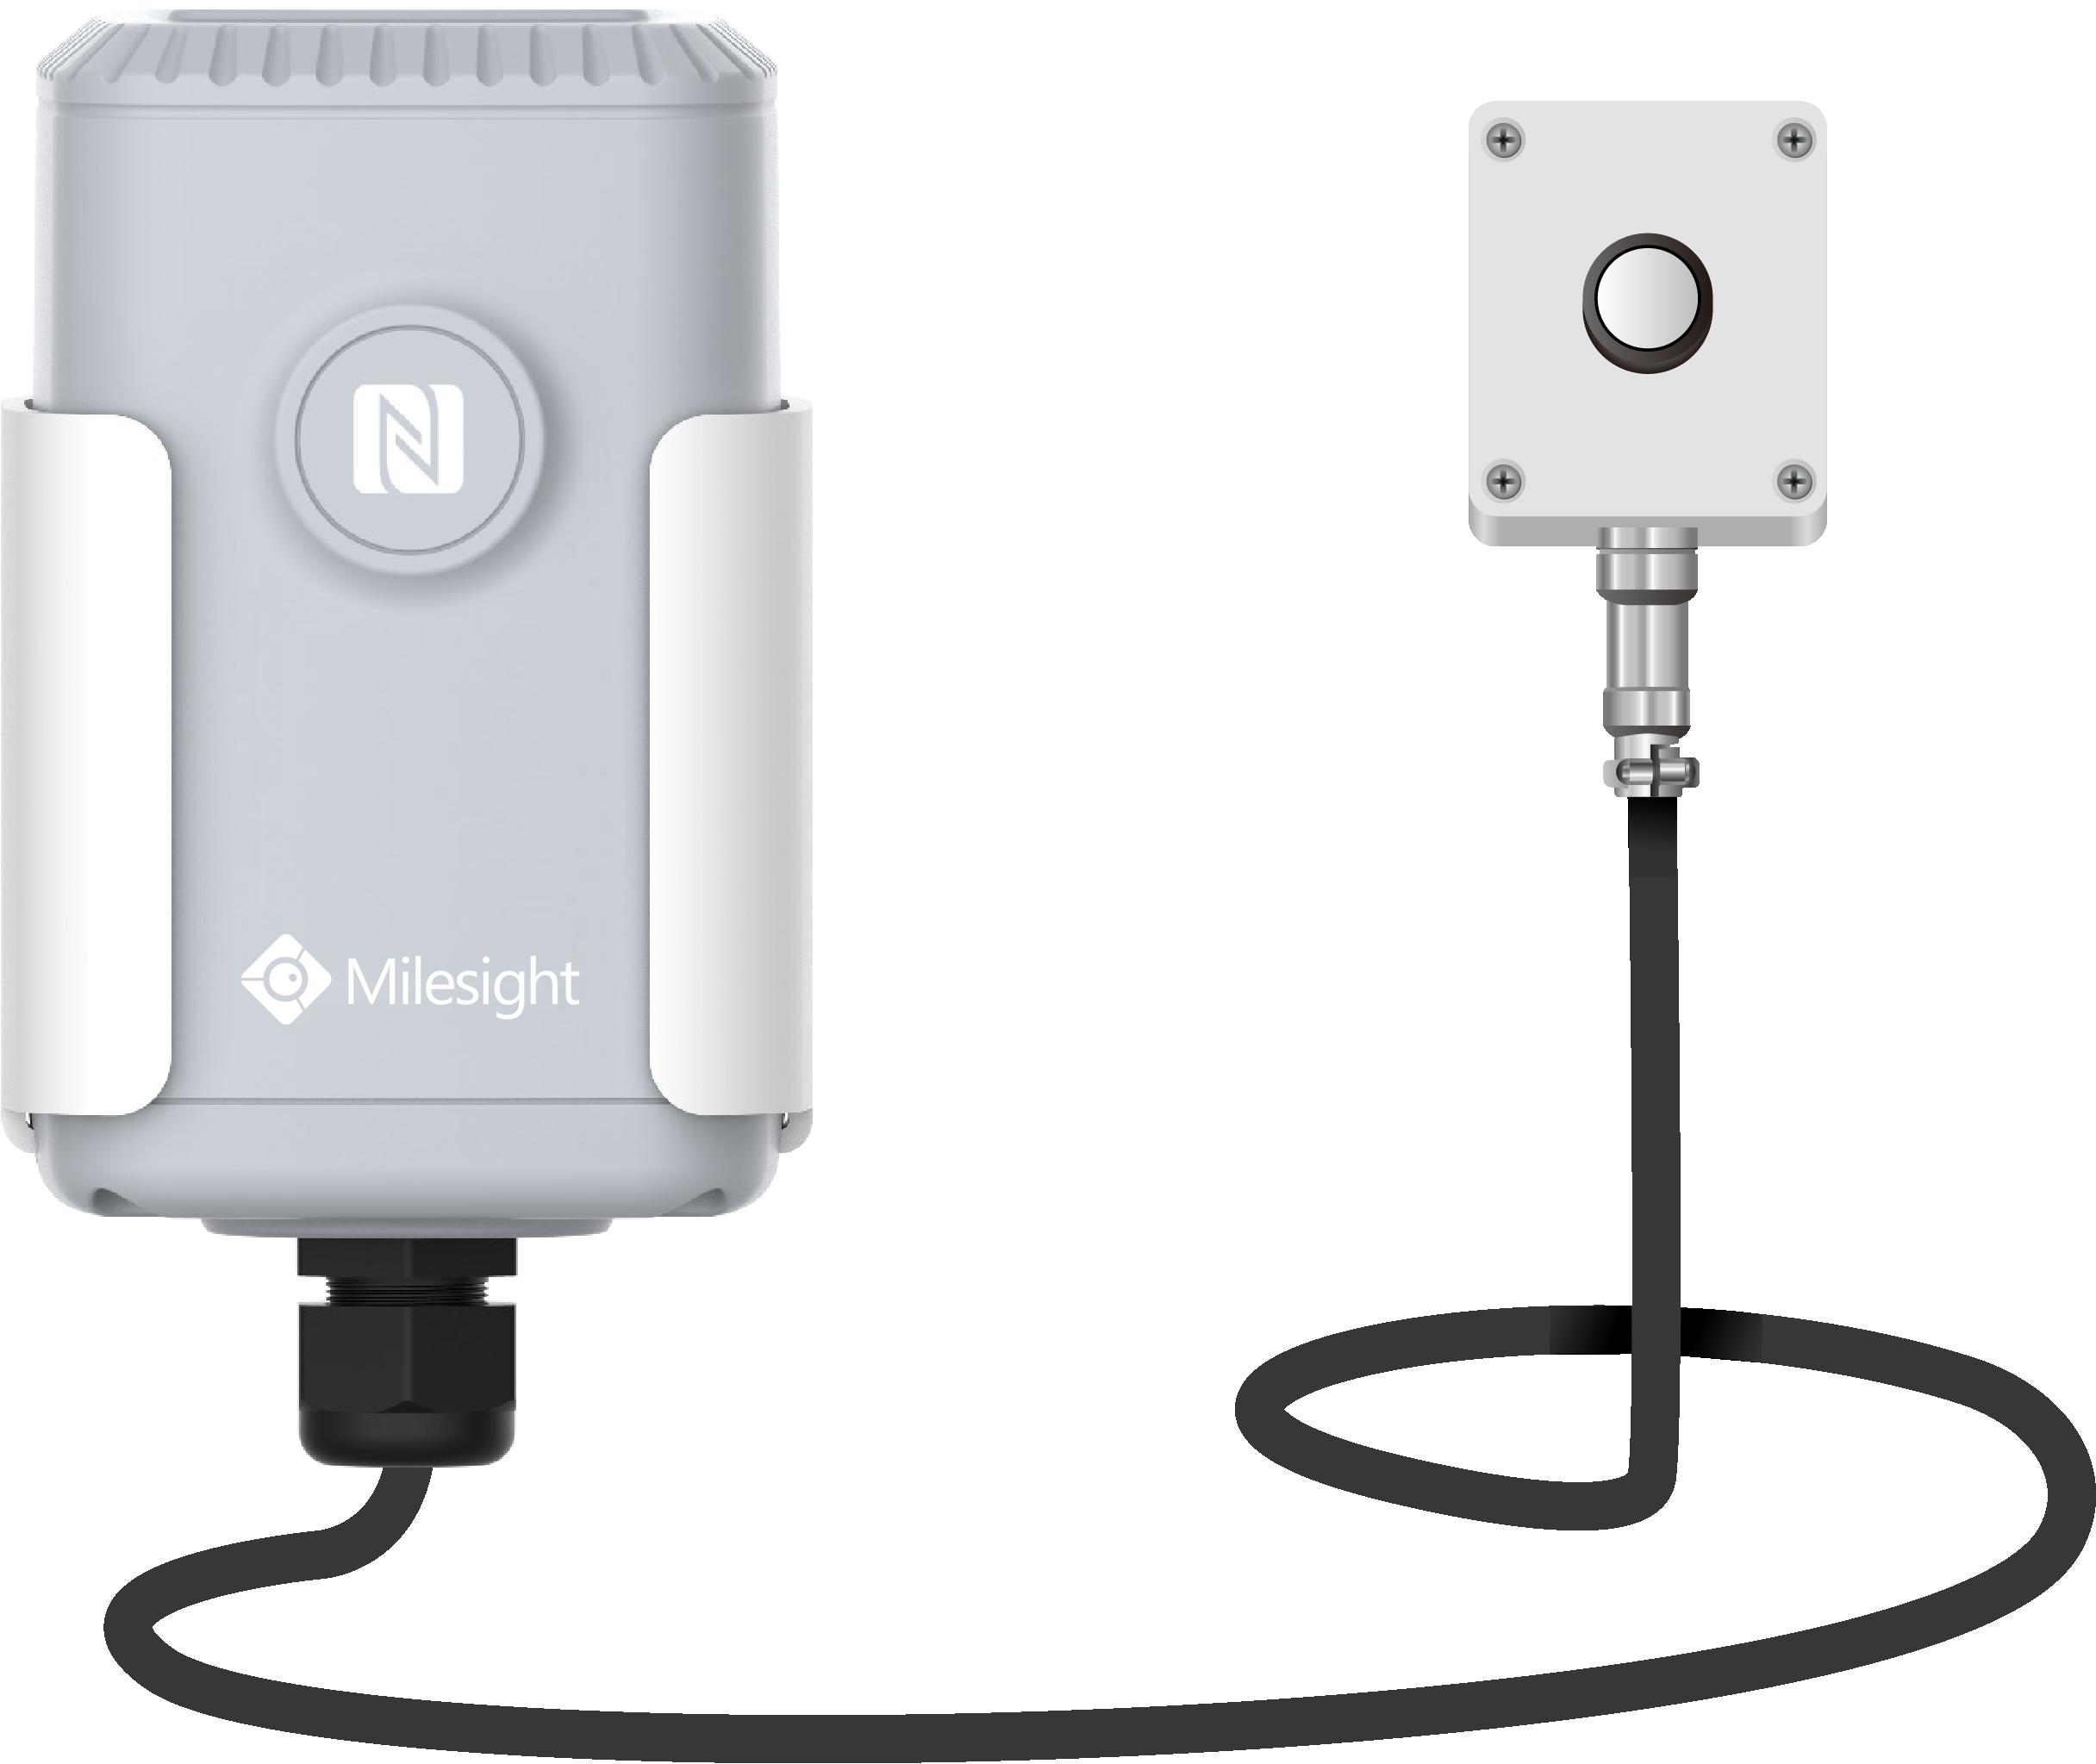 Milesight IoT EM500-LGT LoRaWAN Lichtsensor